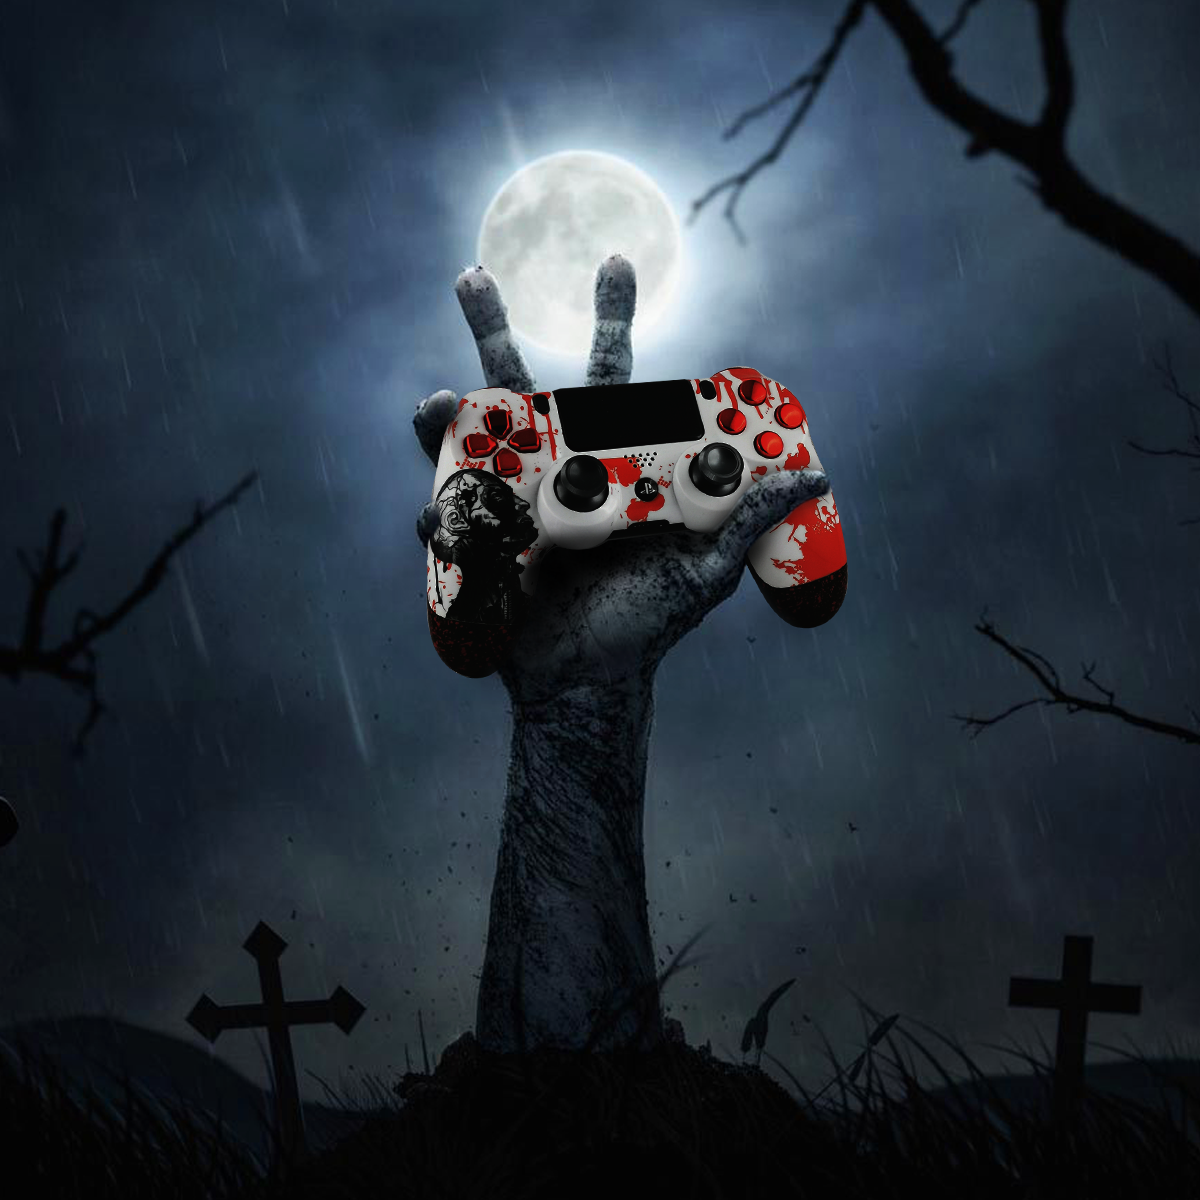 manette apocalypse survival horror halloween